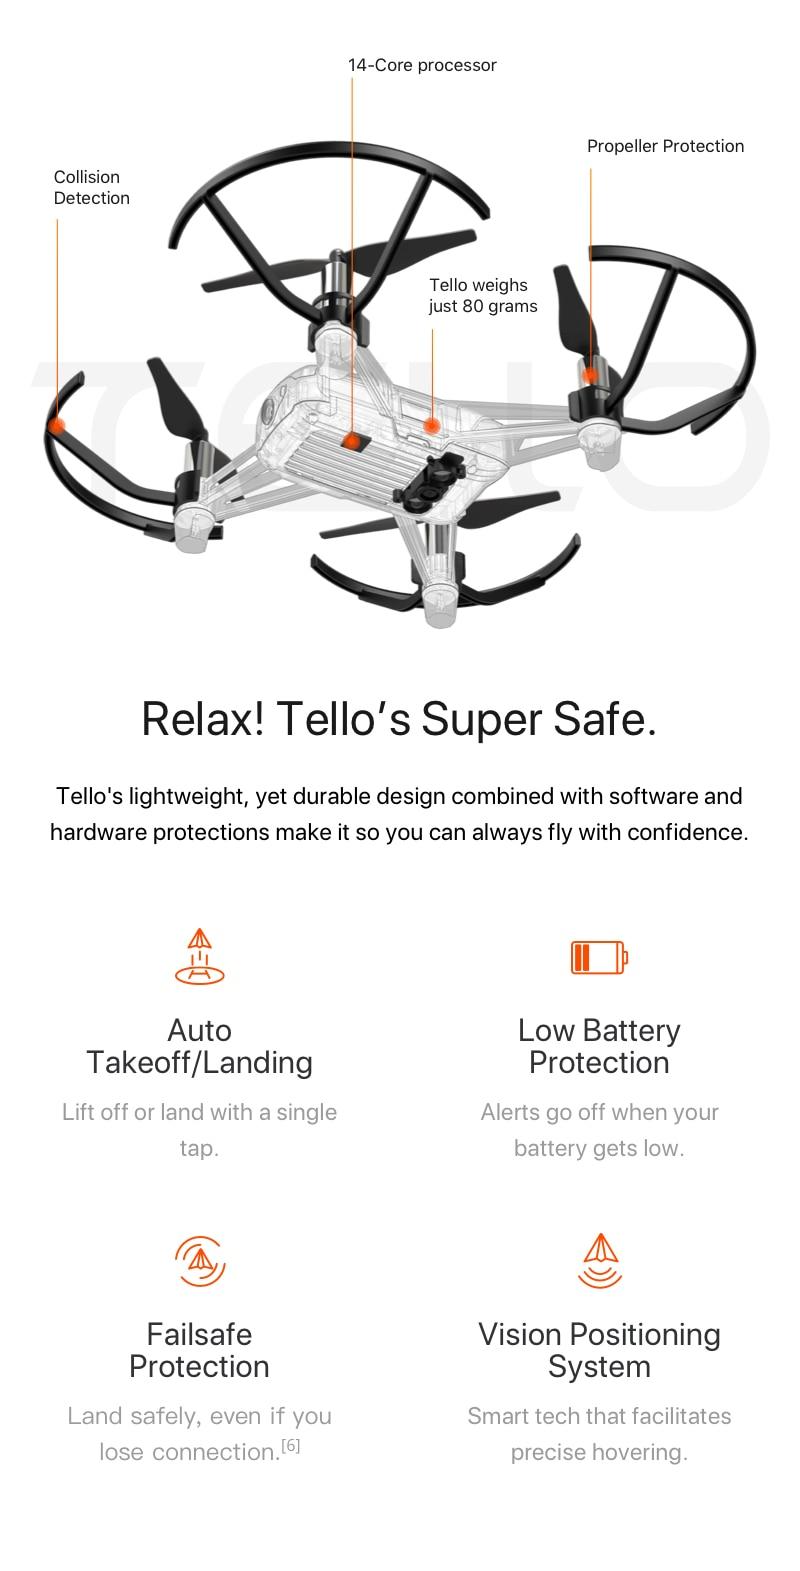 Drone Control CUC Week's 7